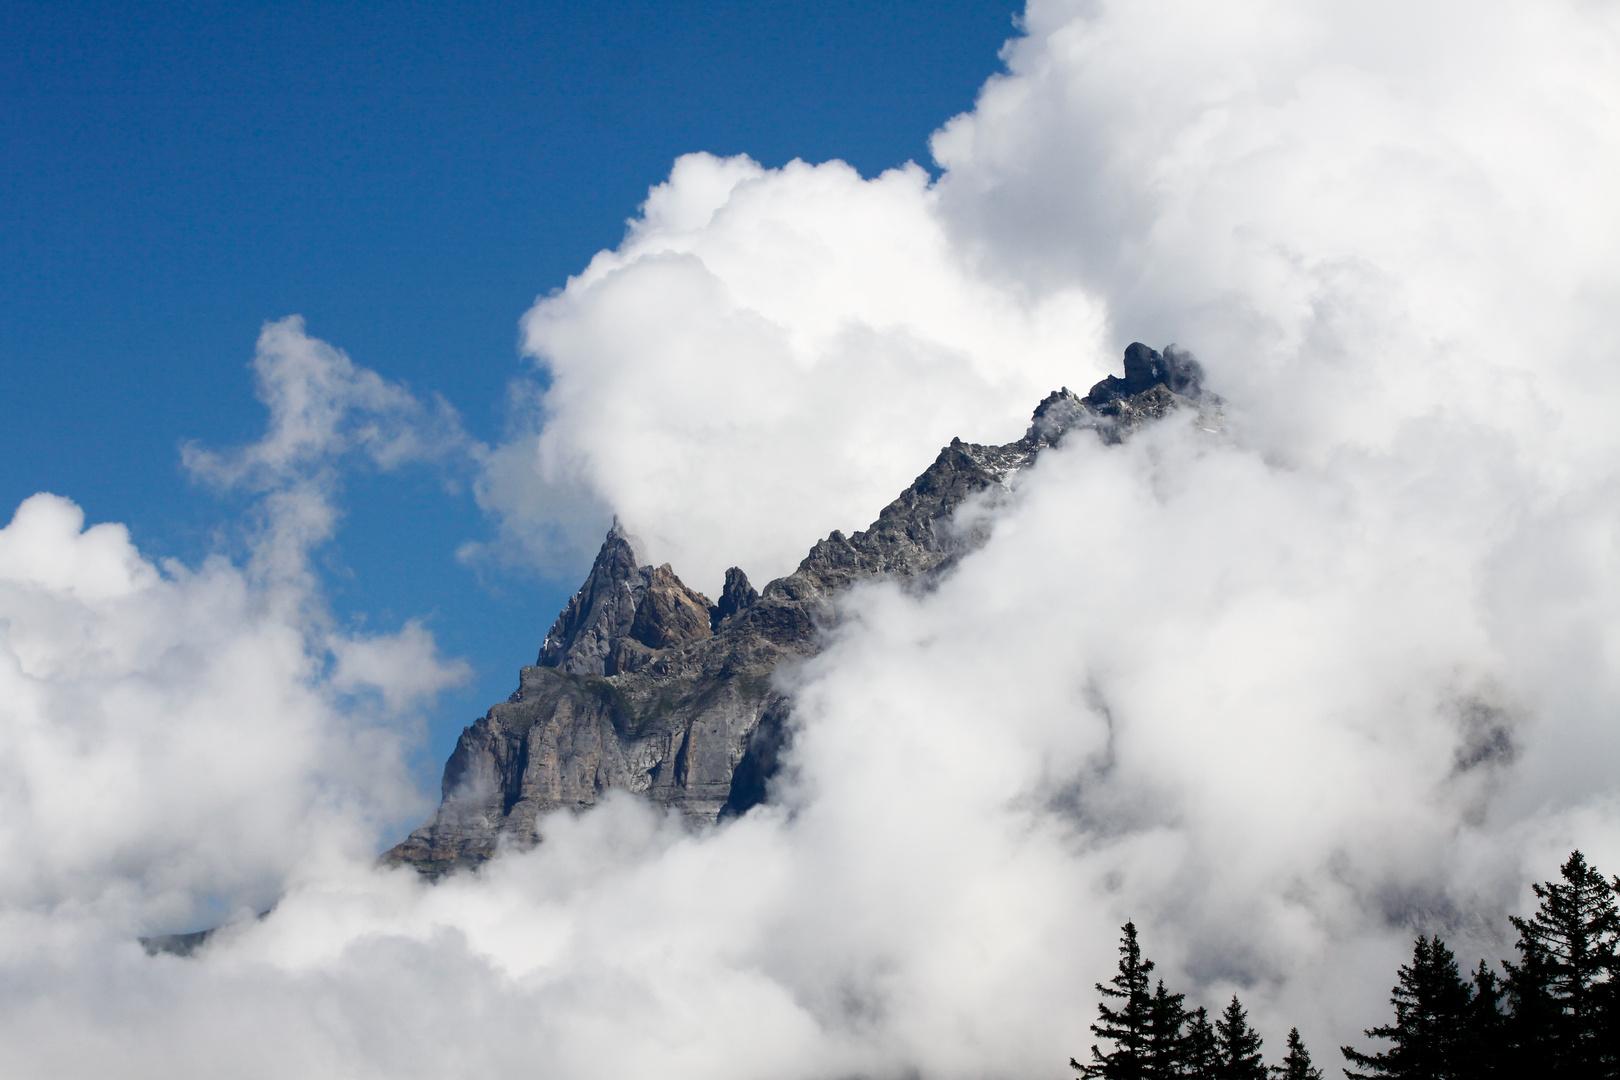 _swiss Alps_ 3